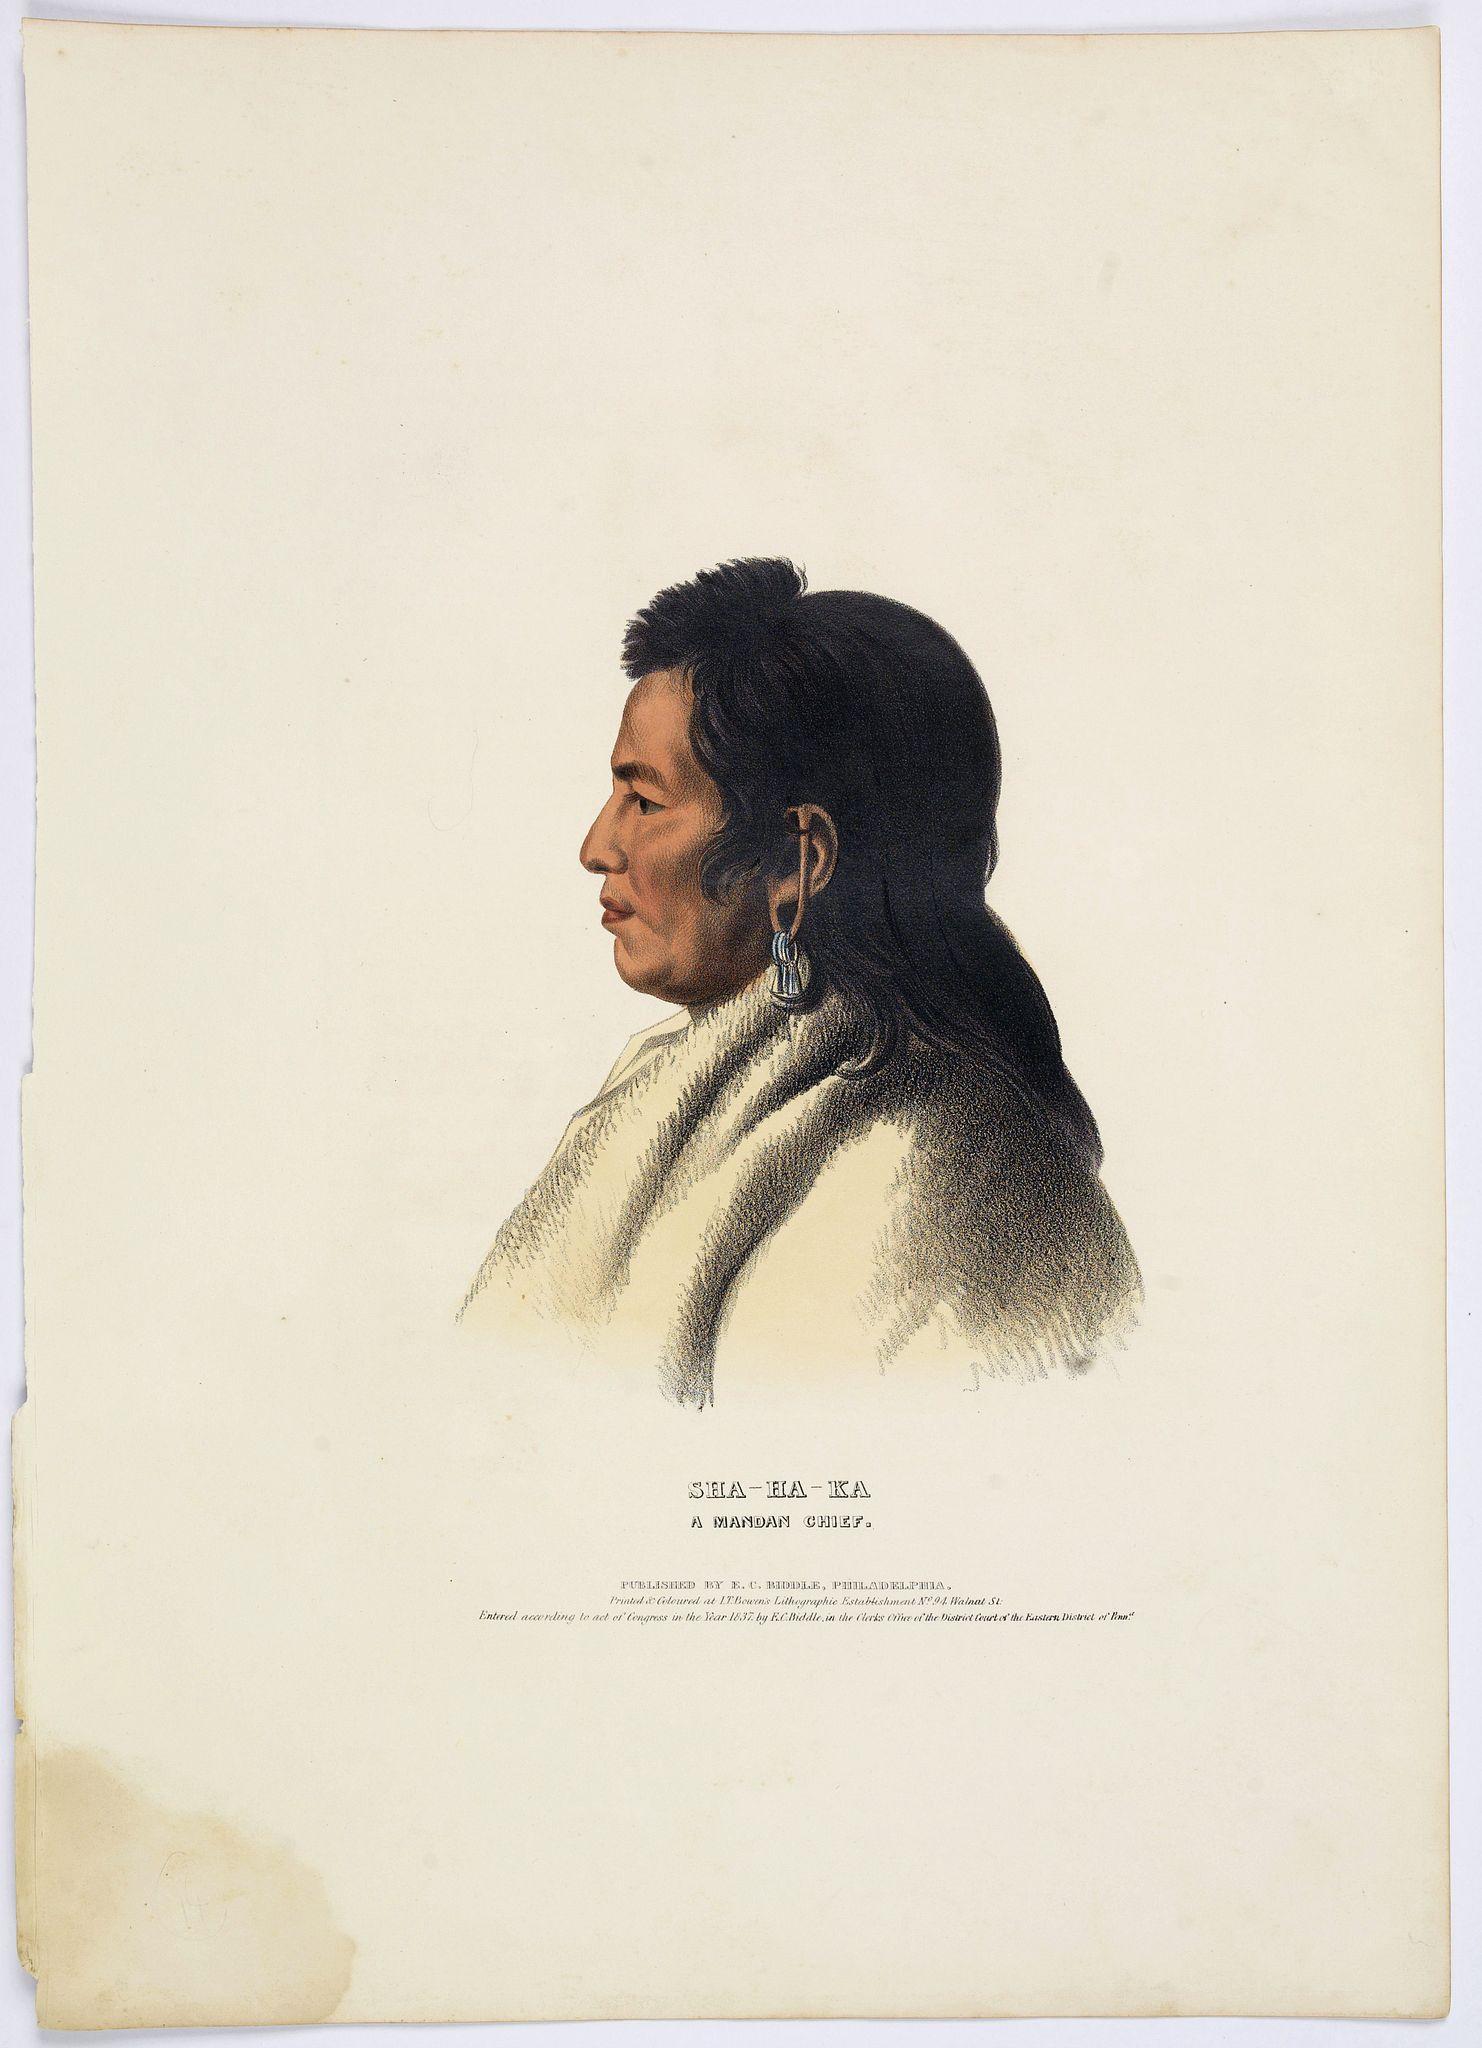 MCKENNEY, T & HALL, J. -  Sha-Ha-Ka. A Mandan Chief.